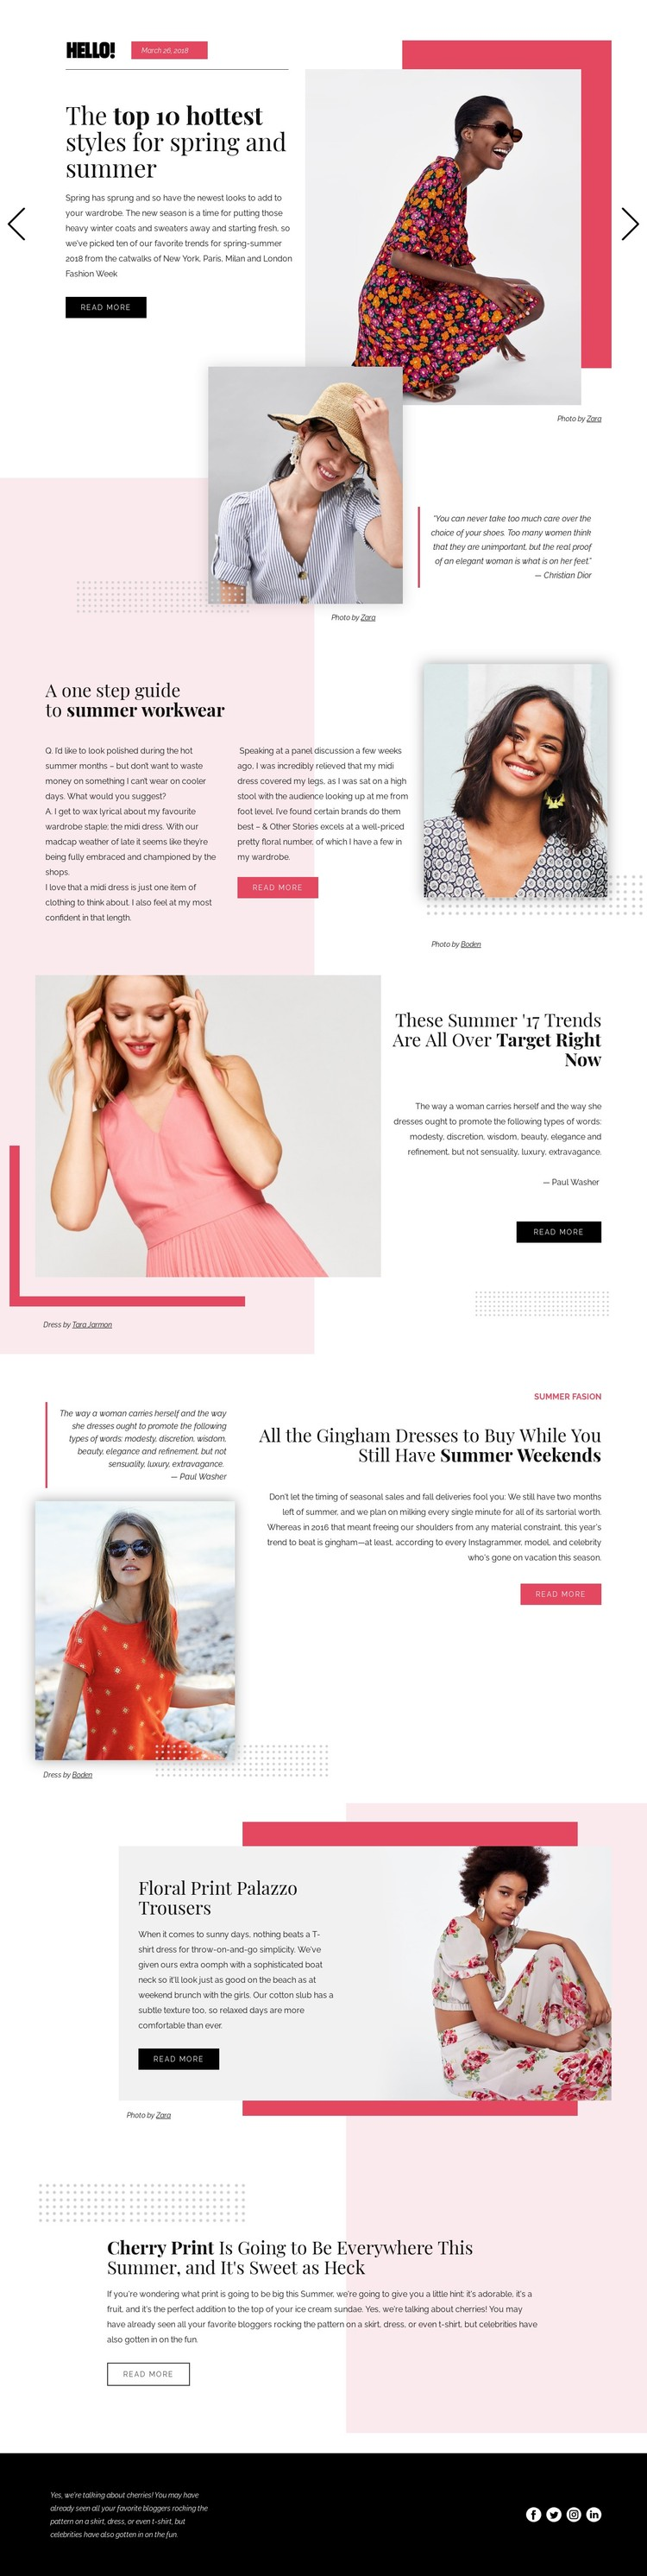 Fashion Trends Static Site Generator